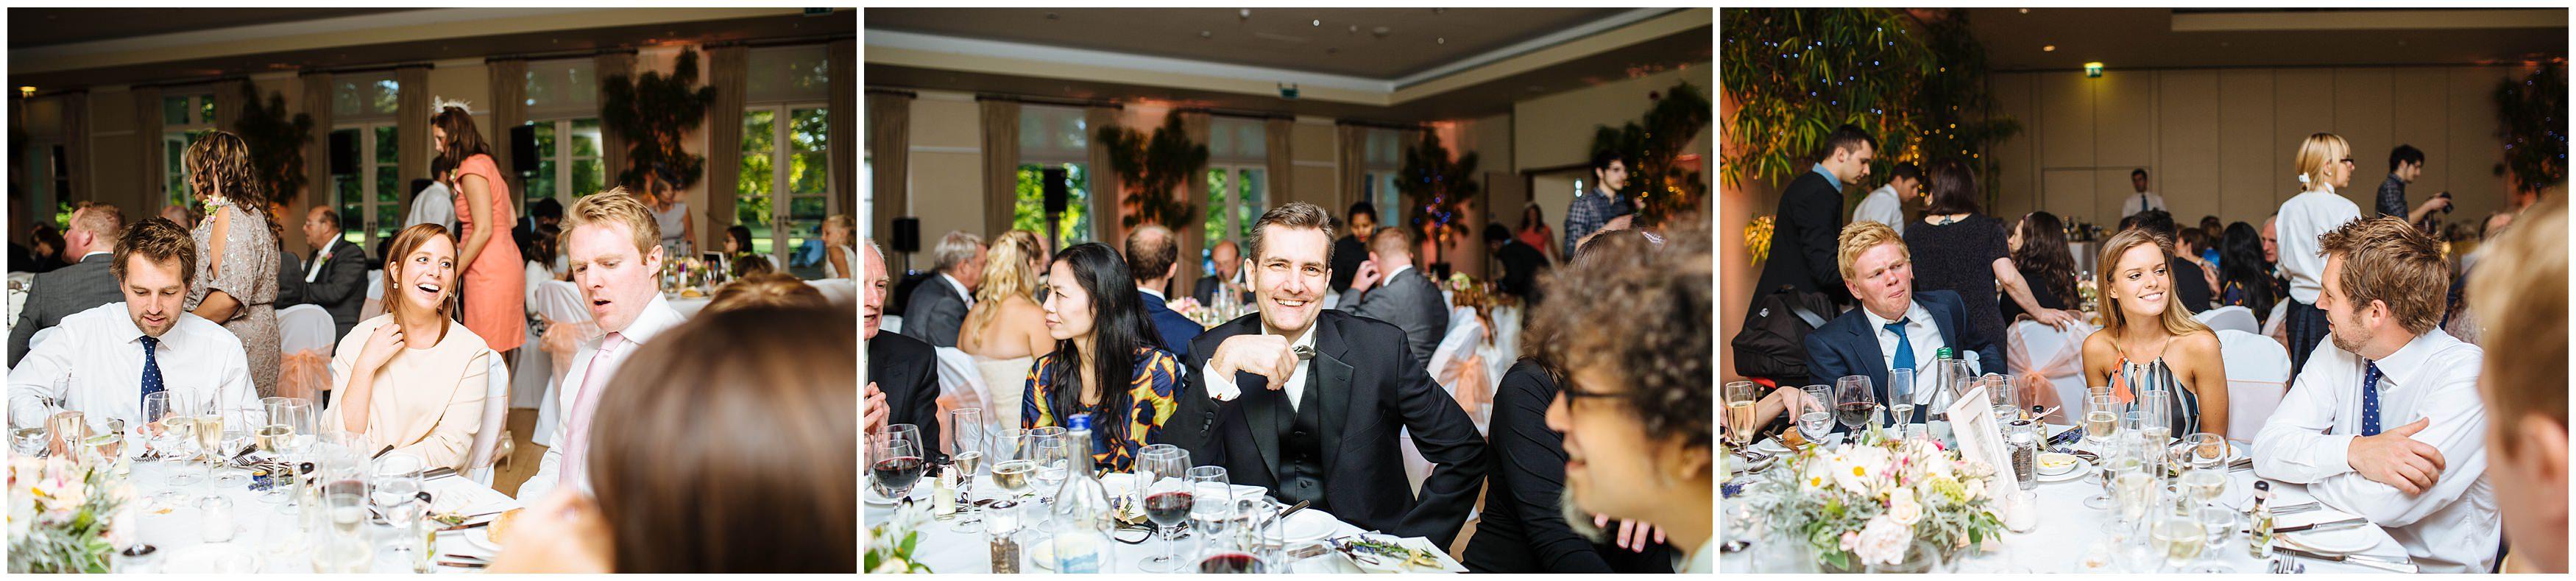 Elegant hurlingham club wedding in london laura debourde photography